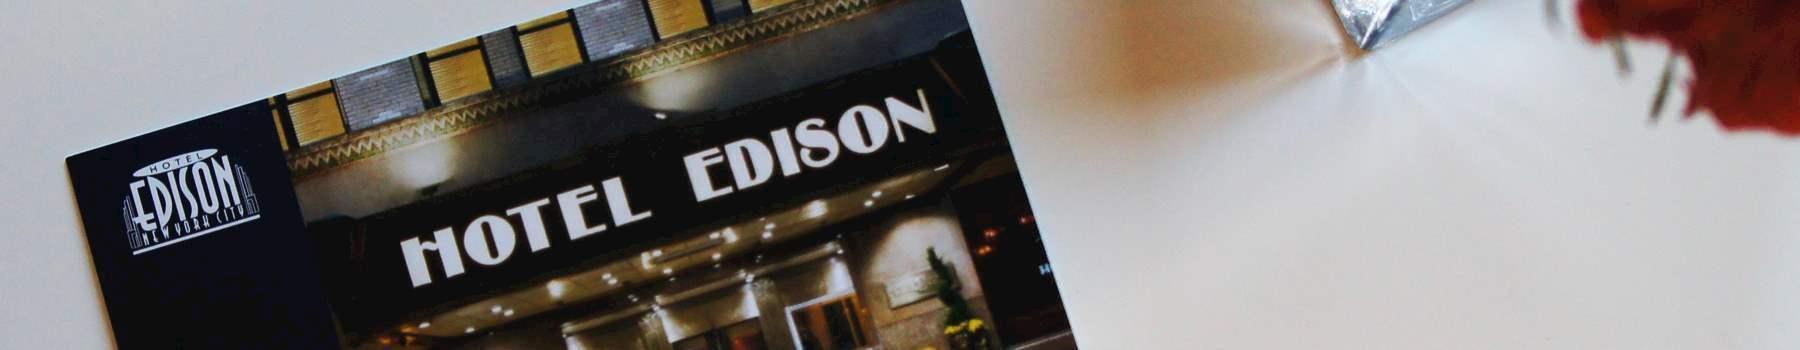 Email offer of Hotel Edison Newyork